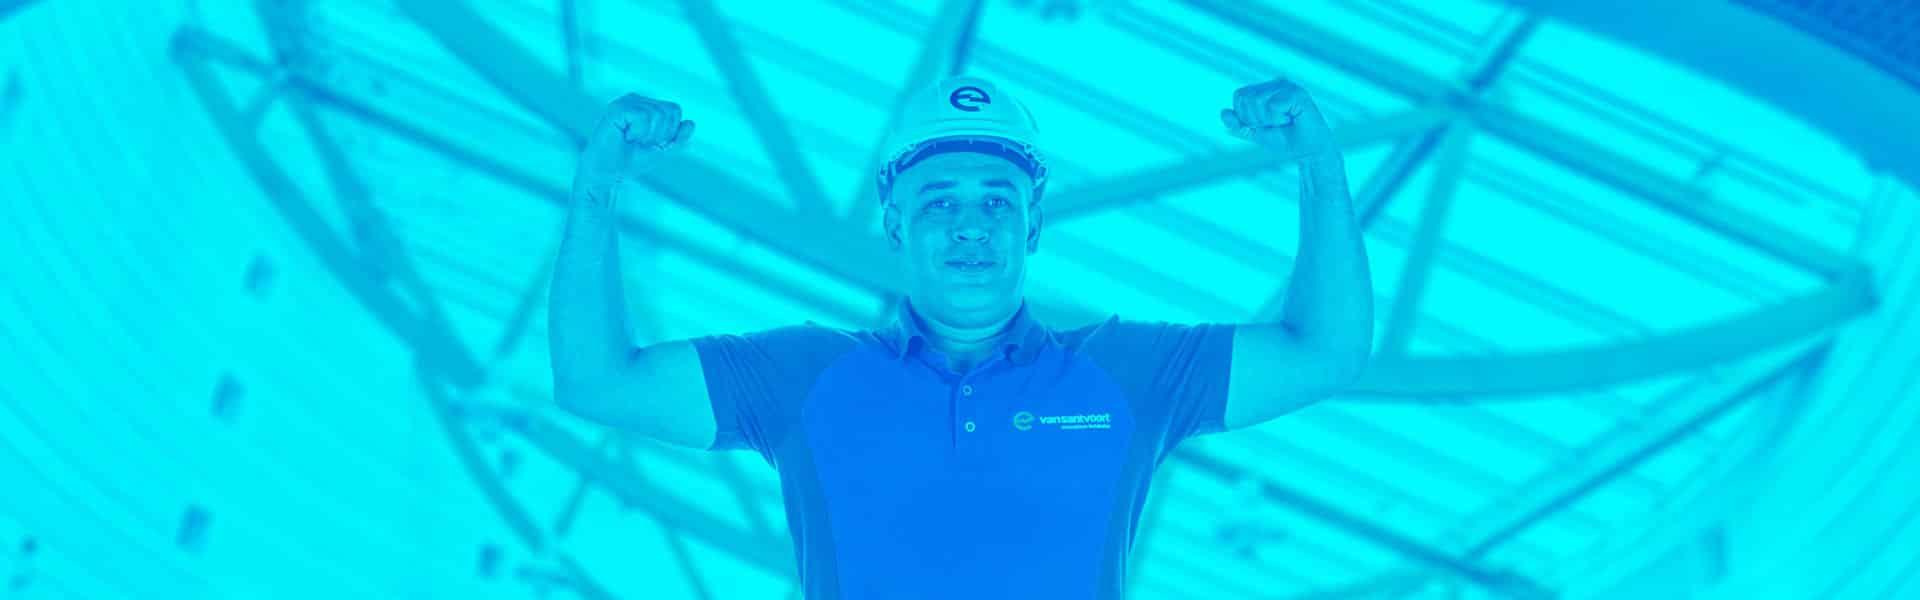 evs-leidinggevend-monteur-elektrotechniek